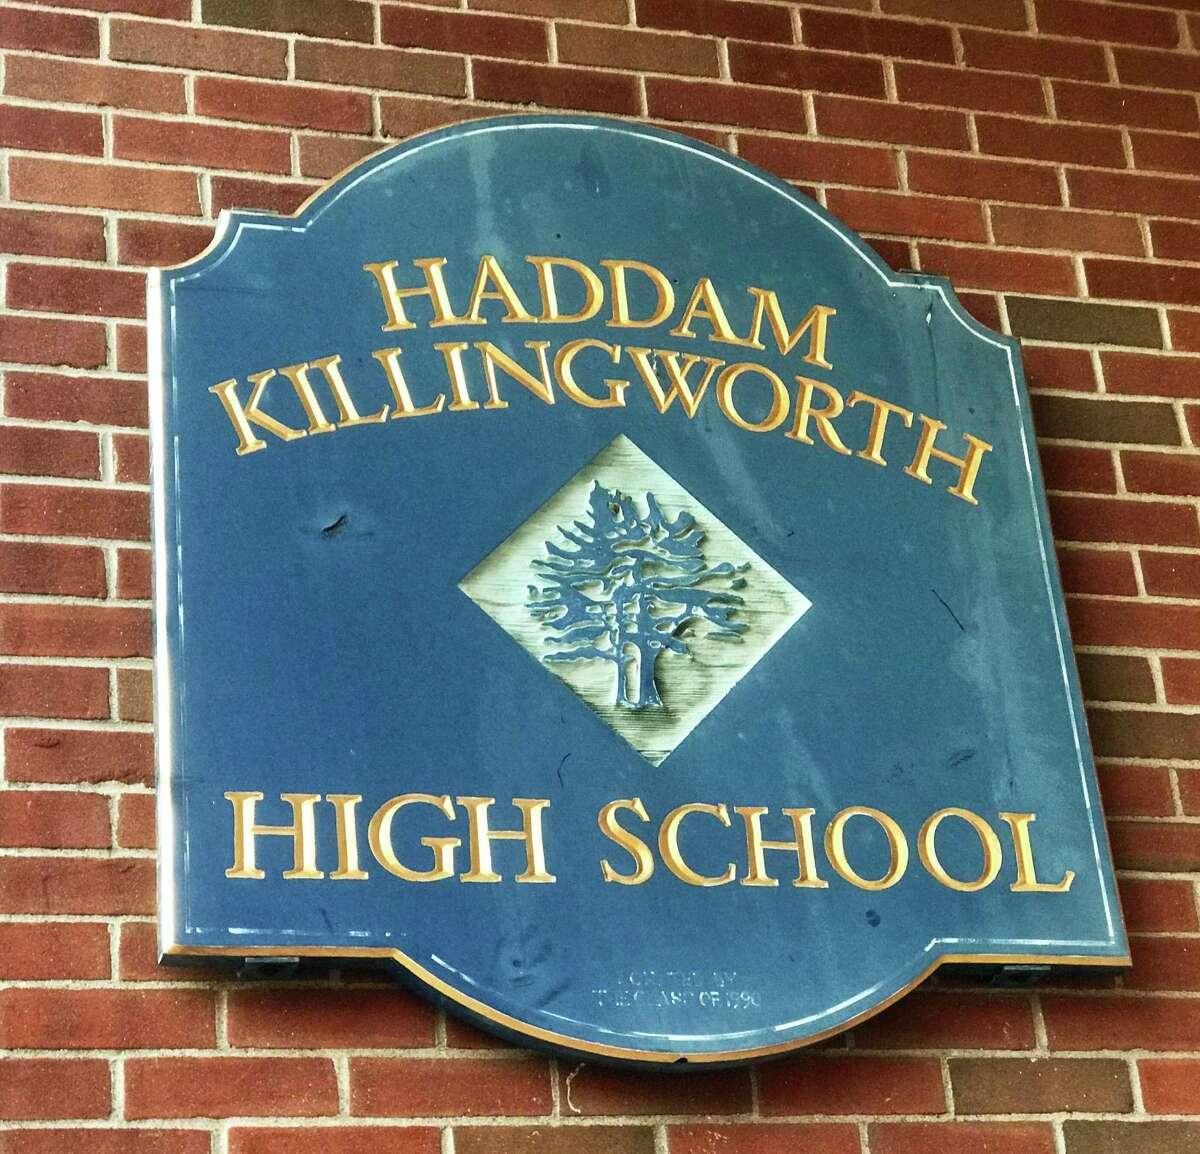 Haddam-Killingworth's school district has created a social justice action plan.